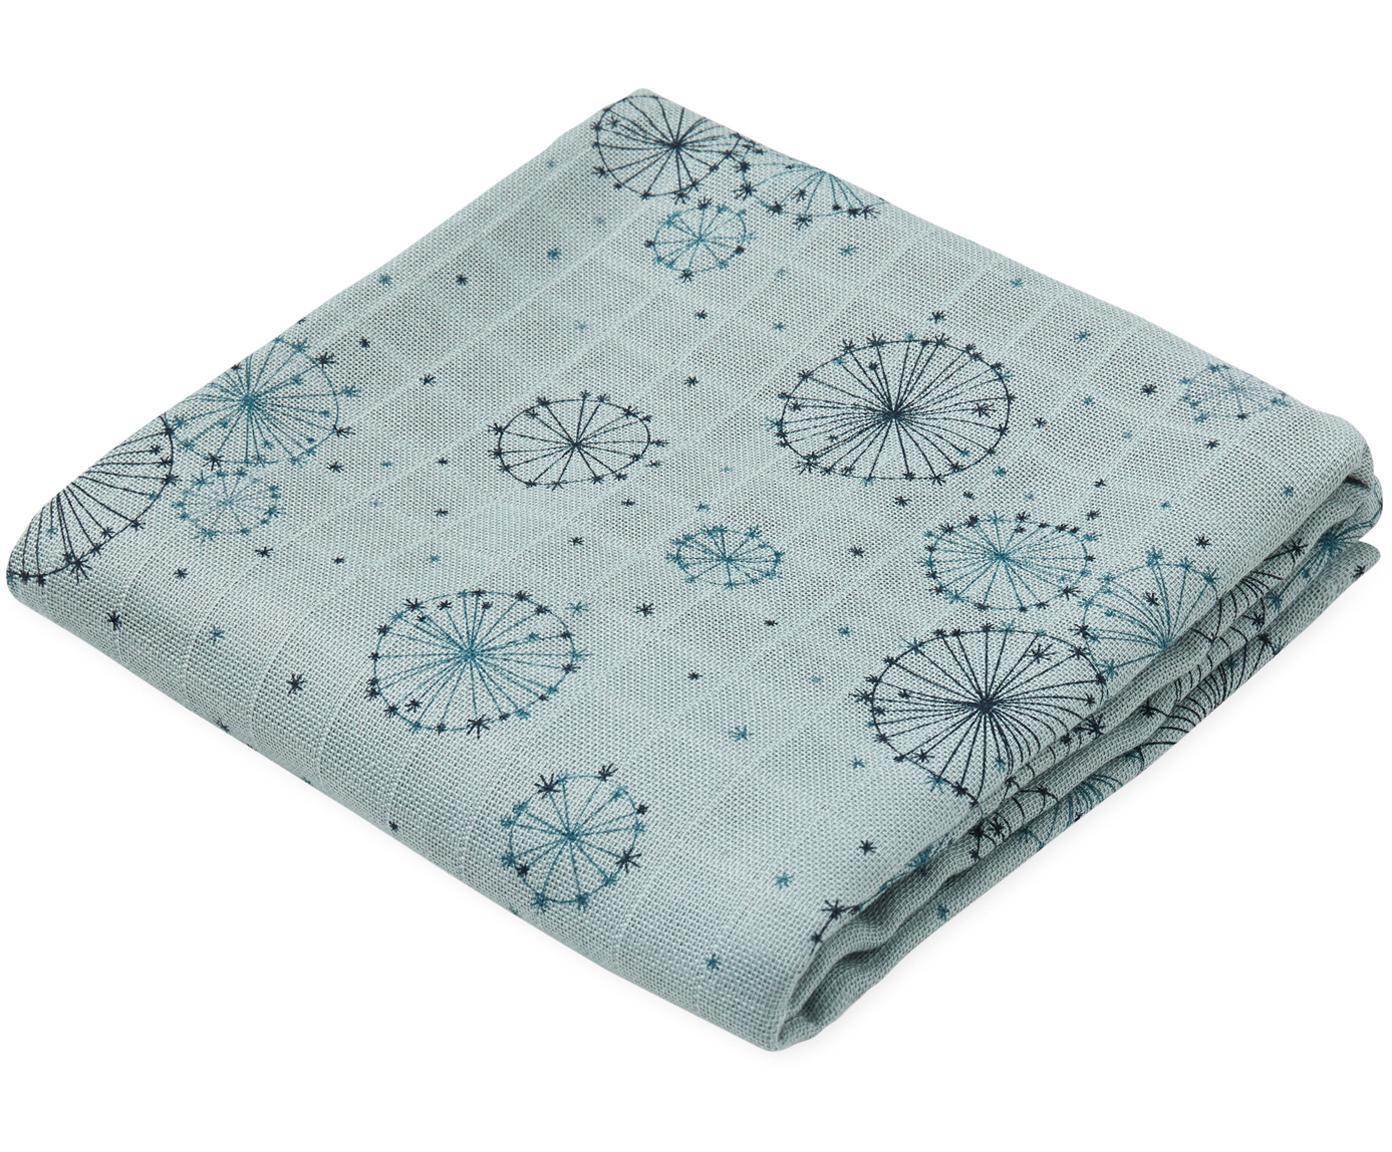 Pañales de tela Dandelion, 2uds., Algodón orgánico, Azul, An 70 x L 70 cm